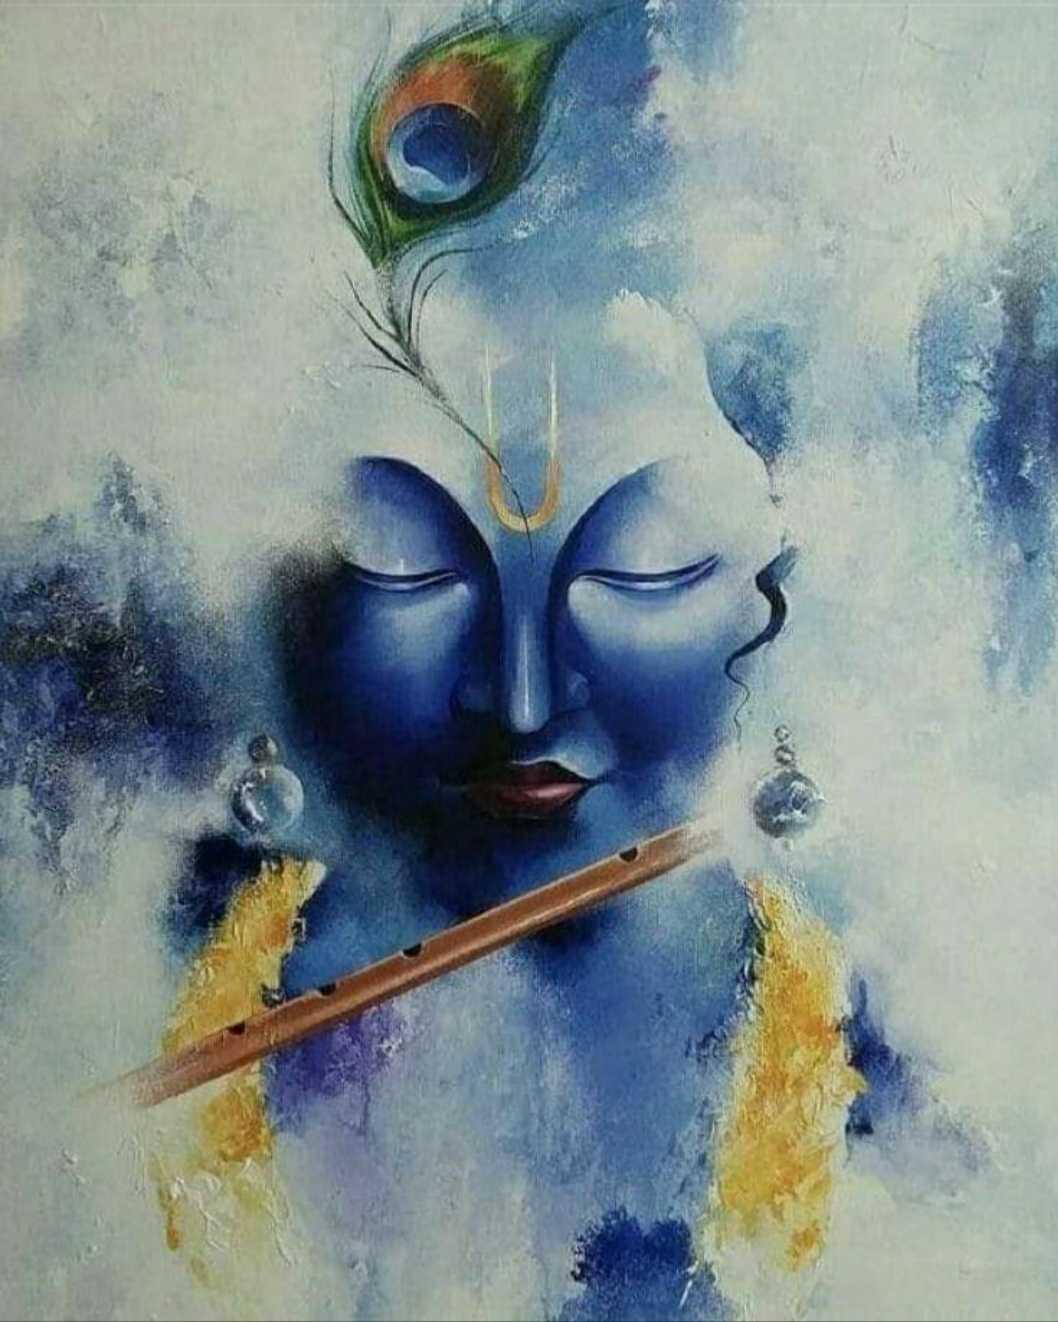 Shri Krishna Lord Art Painting - PhotosBin